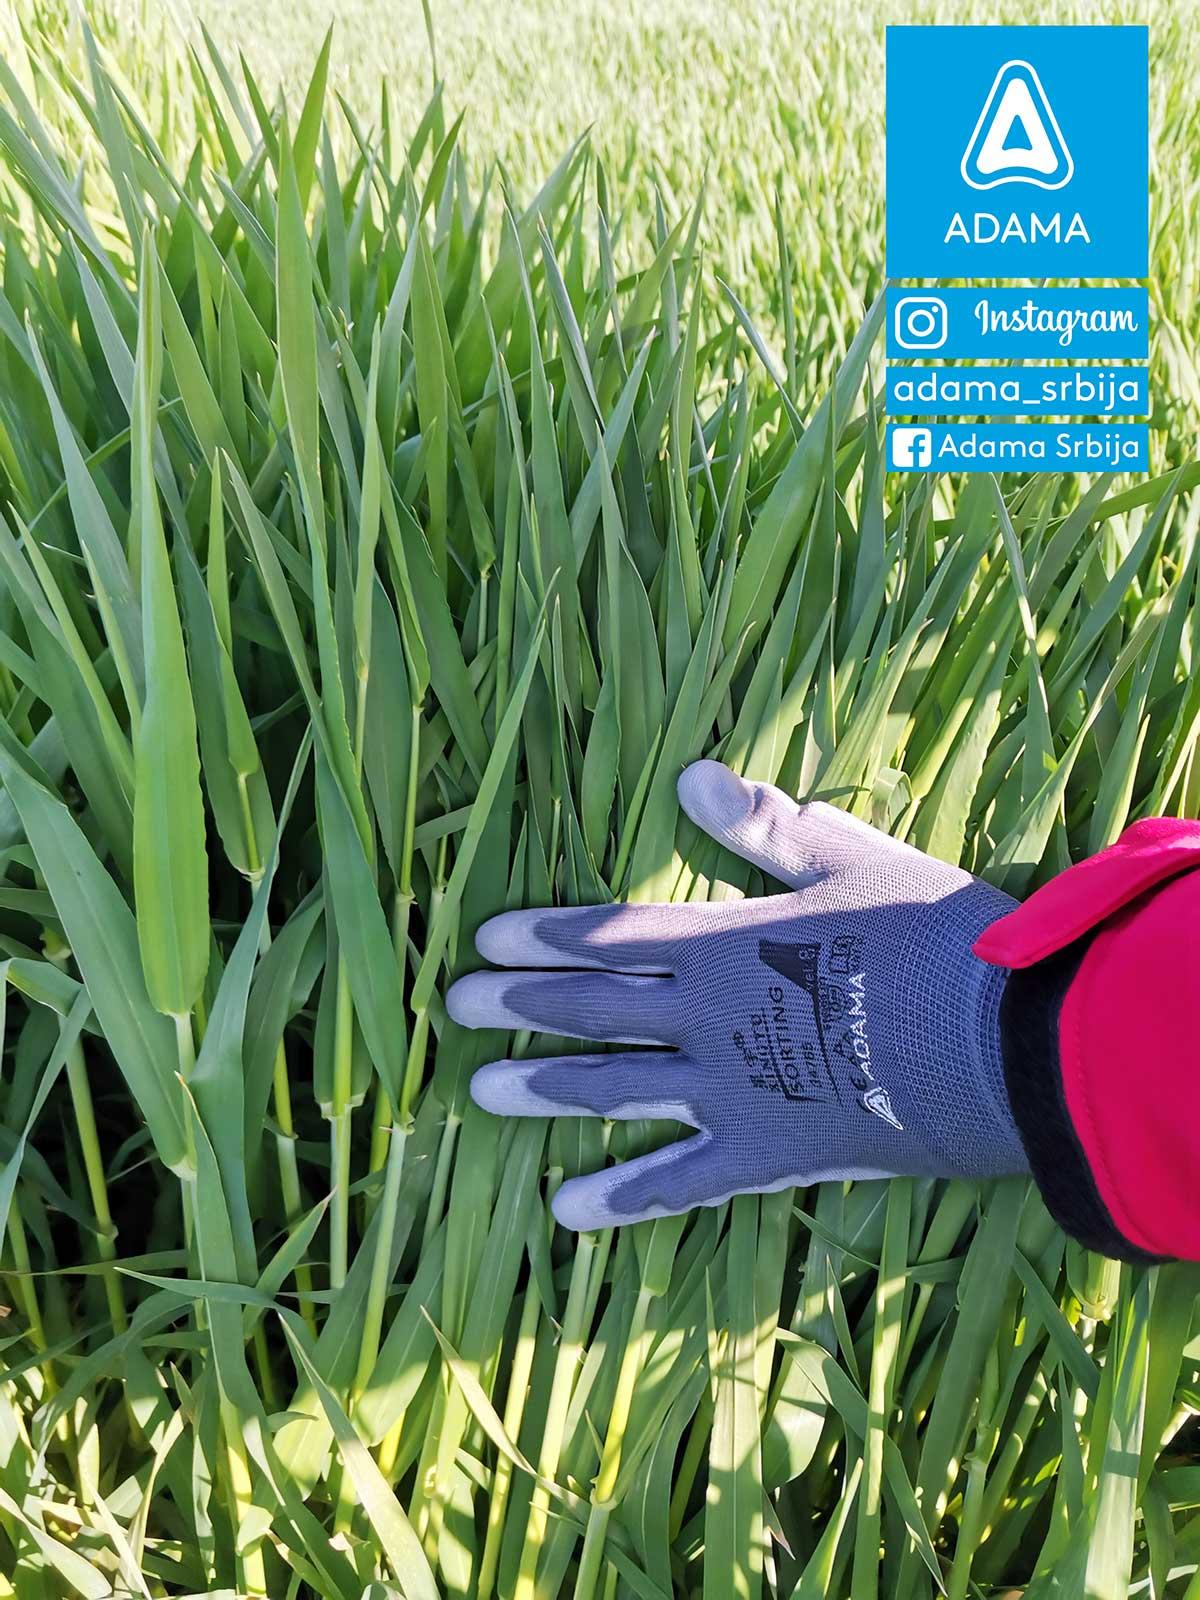 Agrosaveti---Adama---jecam---Custodia---bolest-lista-i-klasa---fungicid-02